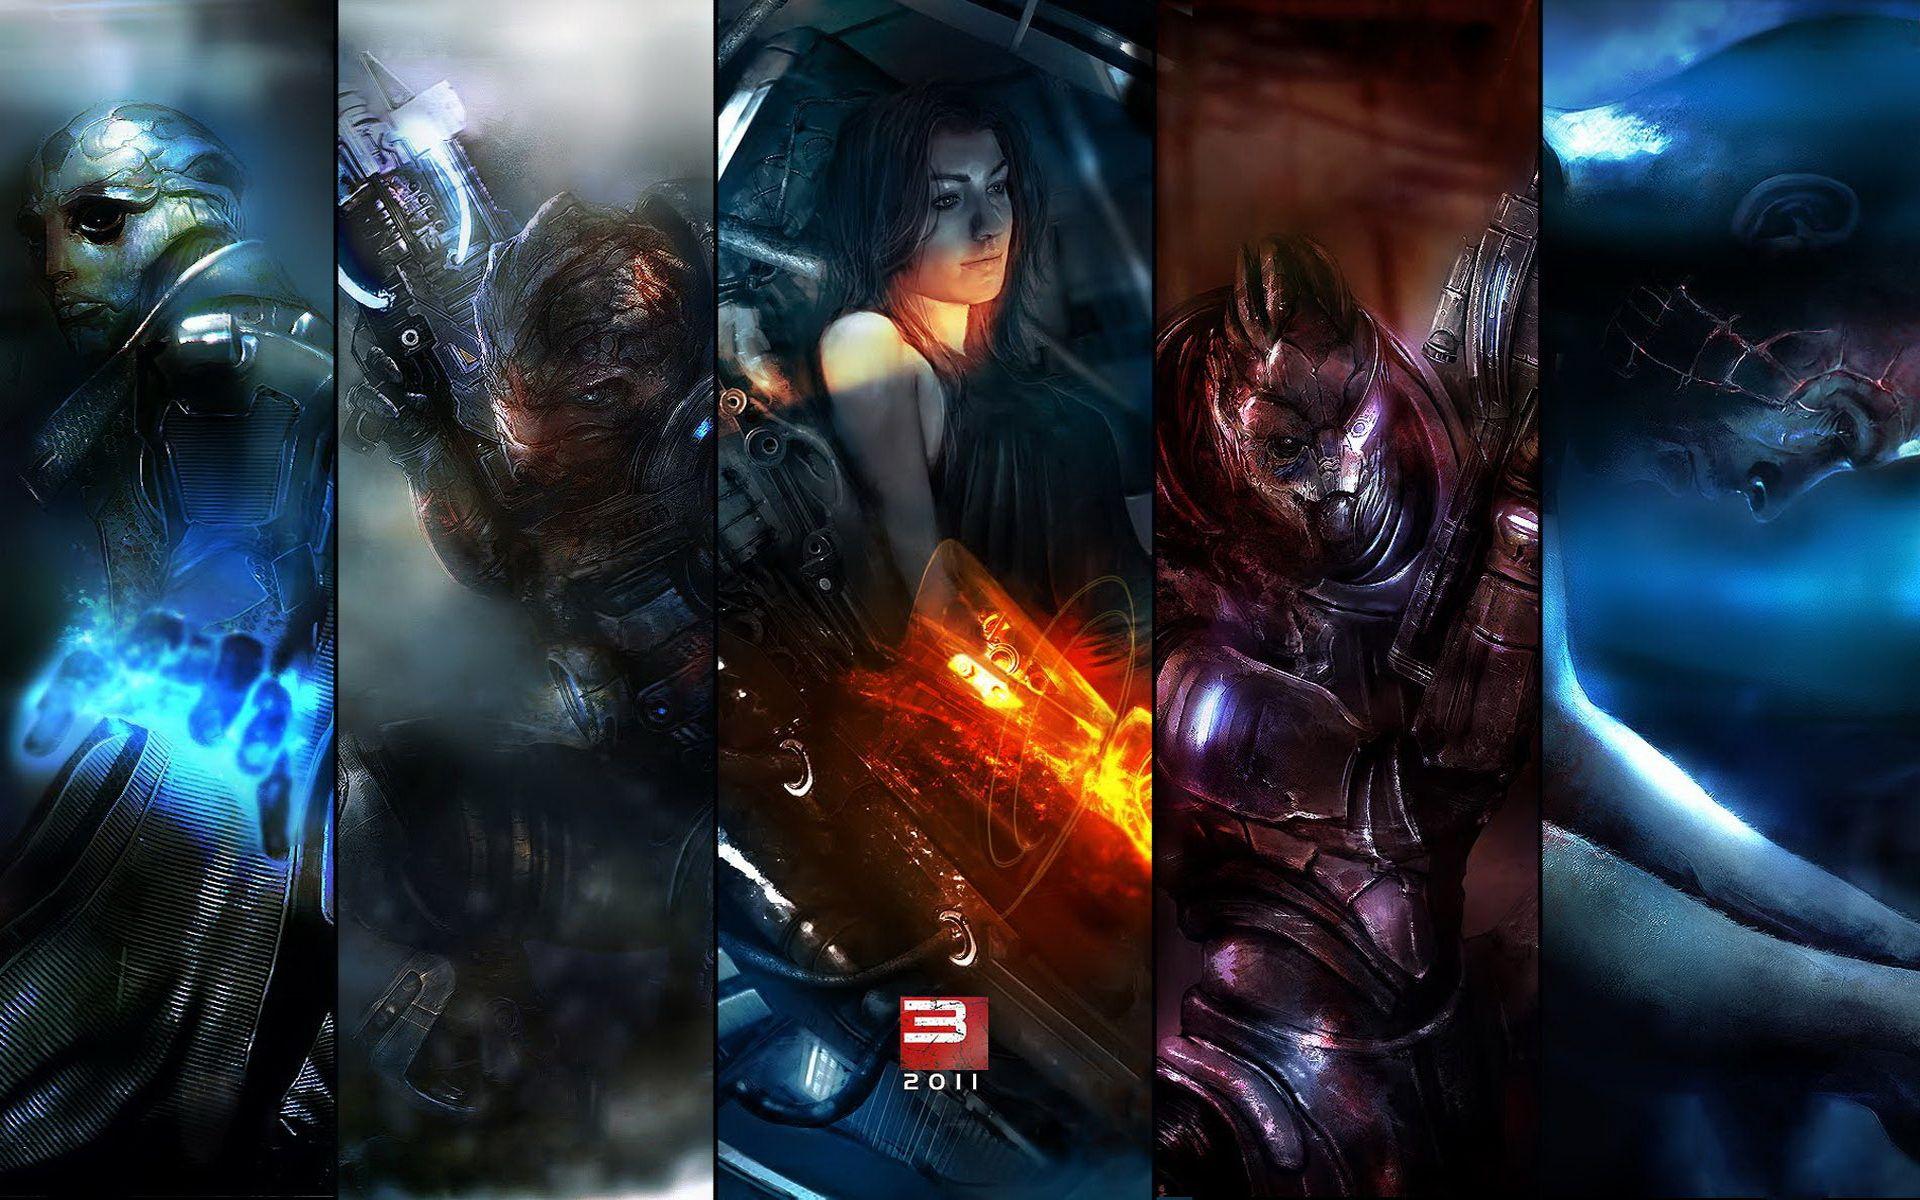 2011 Mass Effect 3 Wallpapers HD Wallpapers Обои фоны